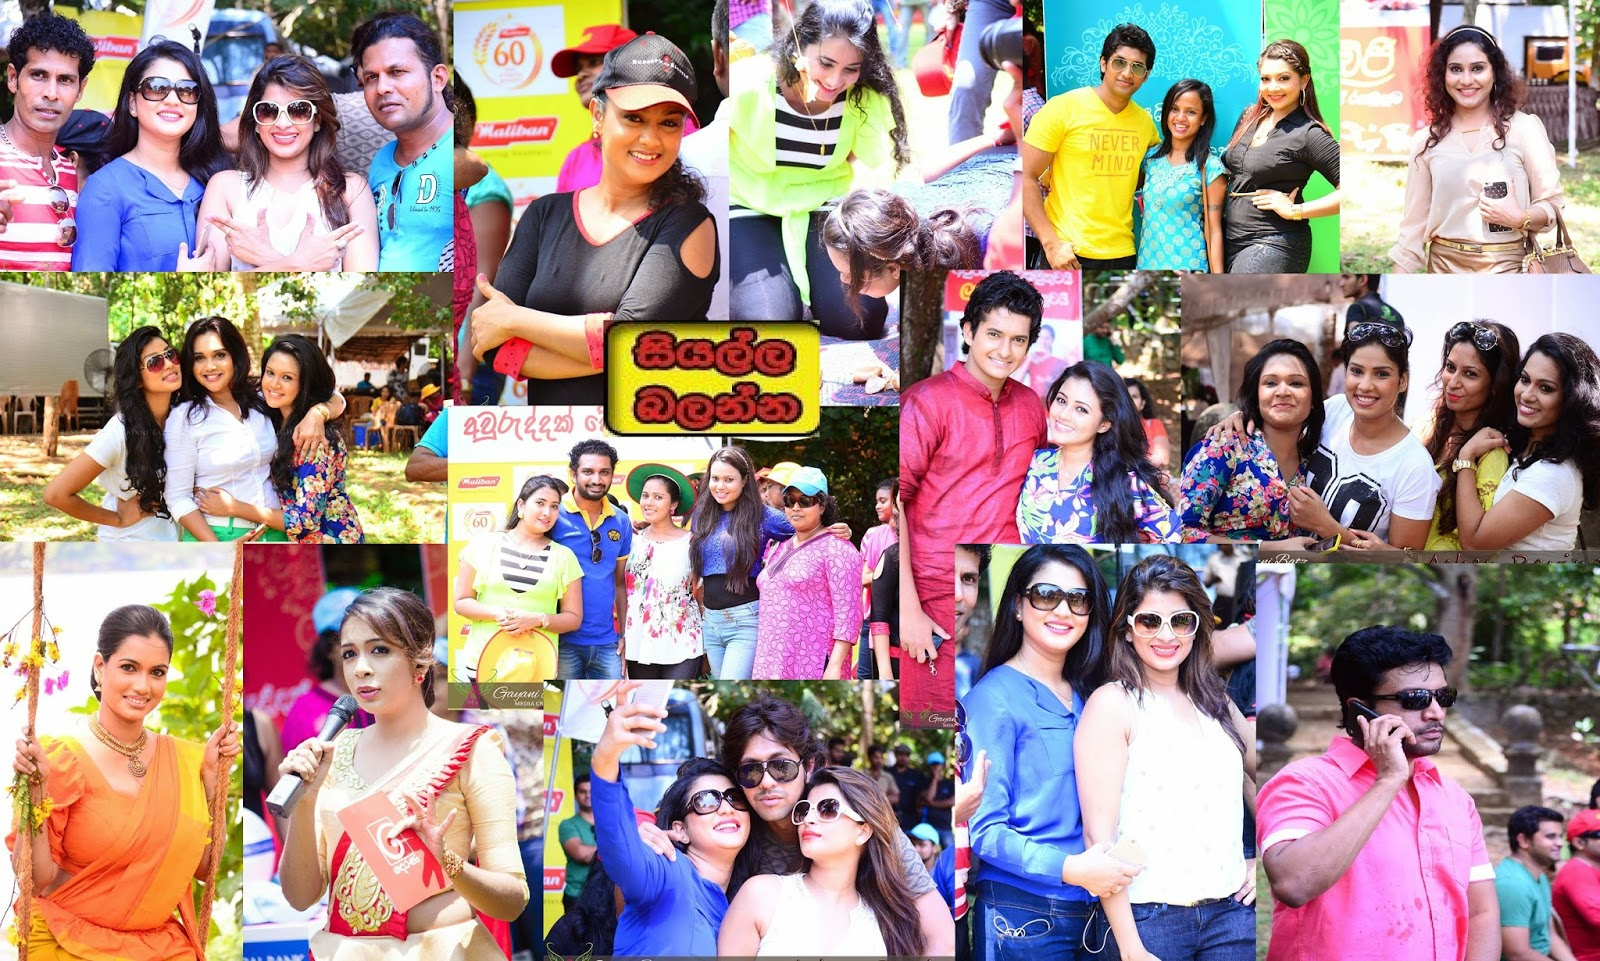 http://picture.gossiplankahotnews.com/2015/03/derana-kala-game-awurudu-2015.html